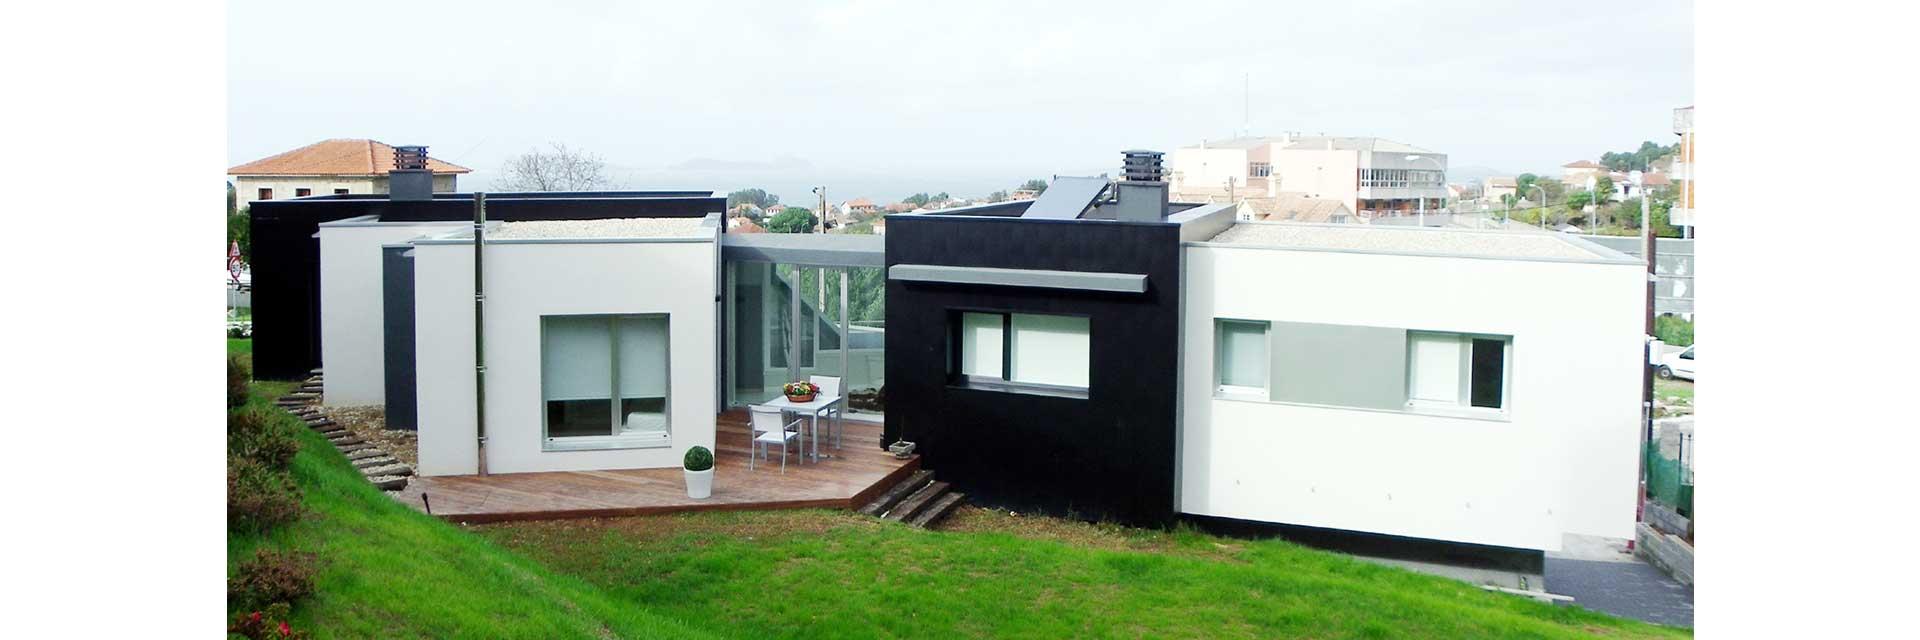 viviendas-modernas